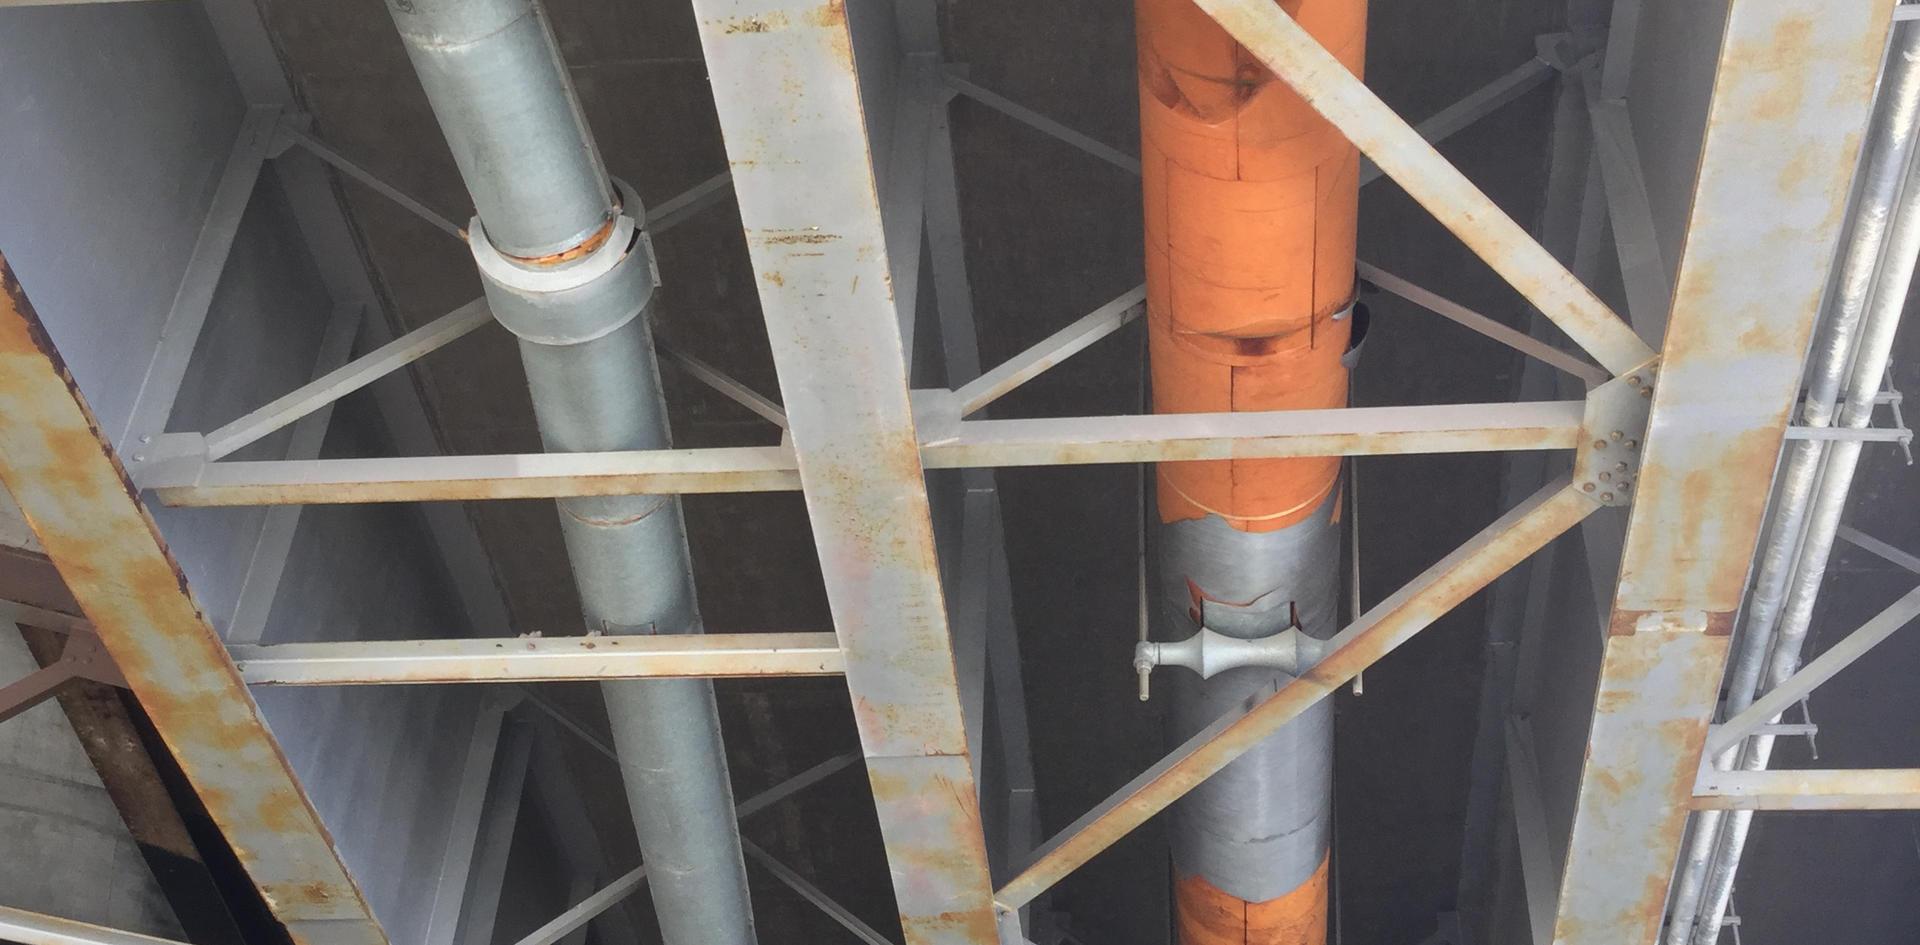 Bridge and pipe infrastrucure inspection